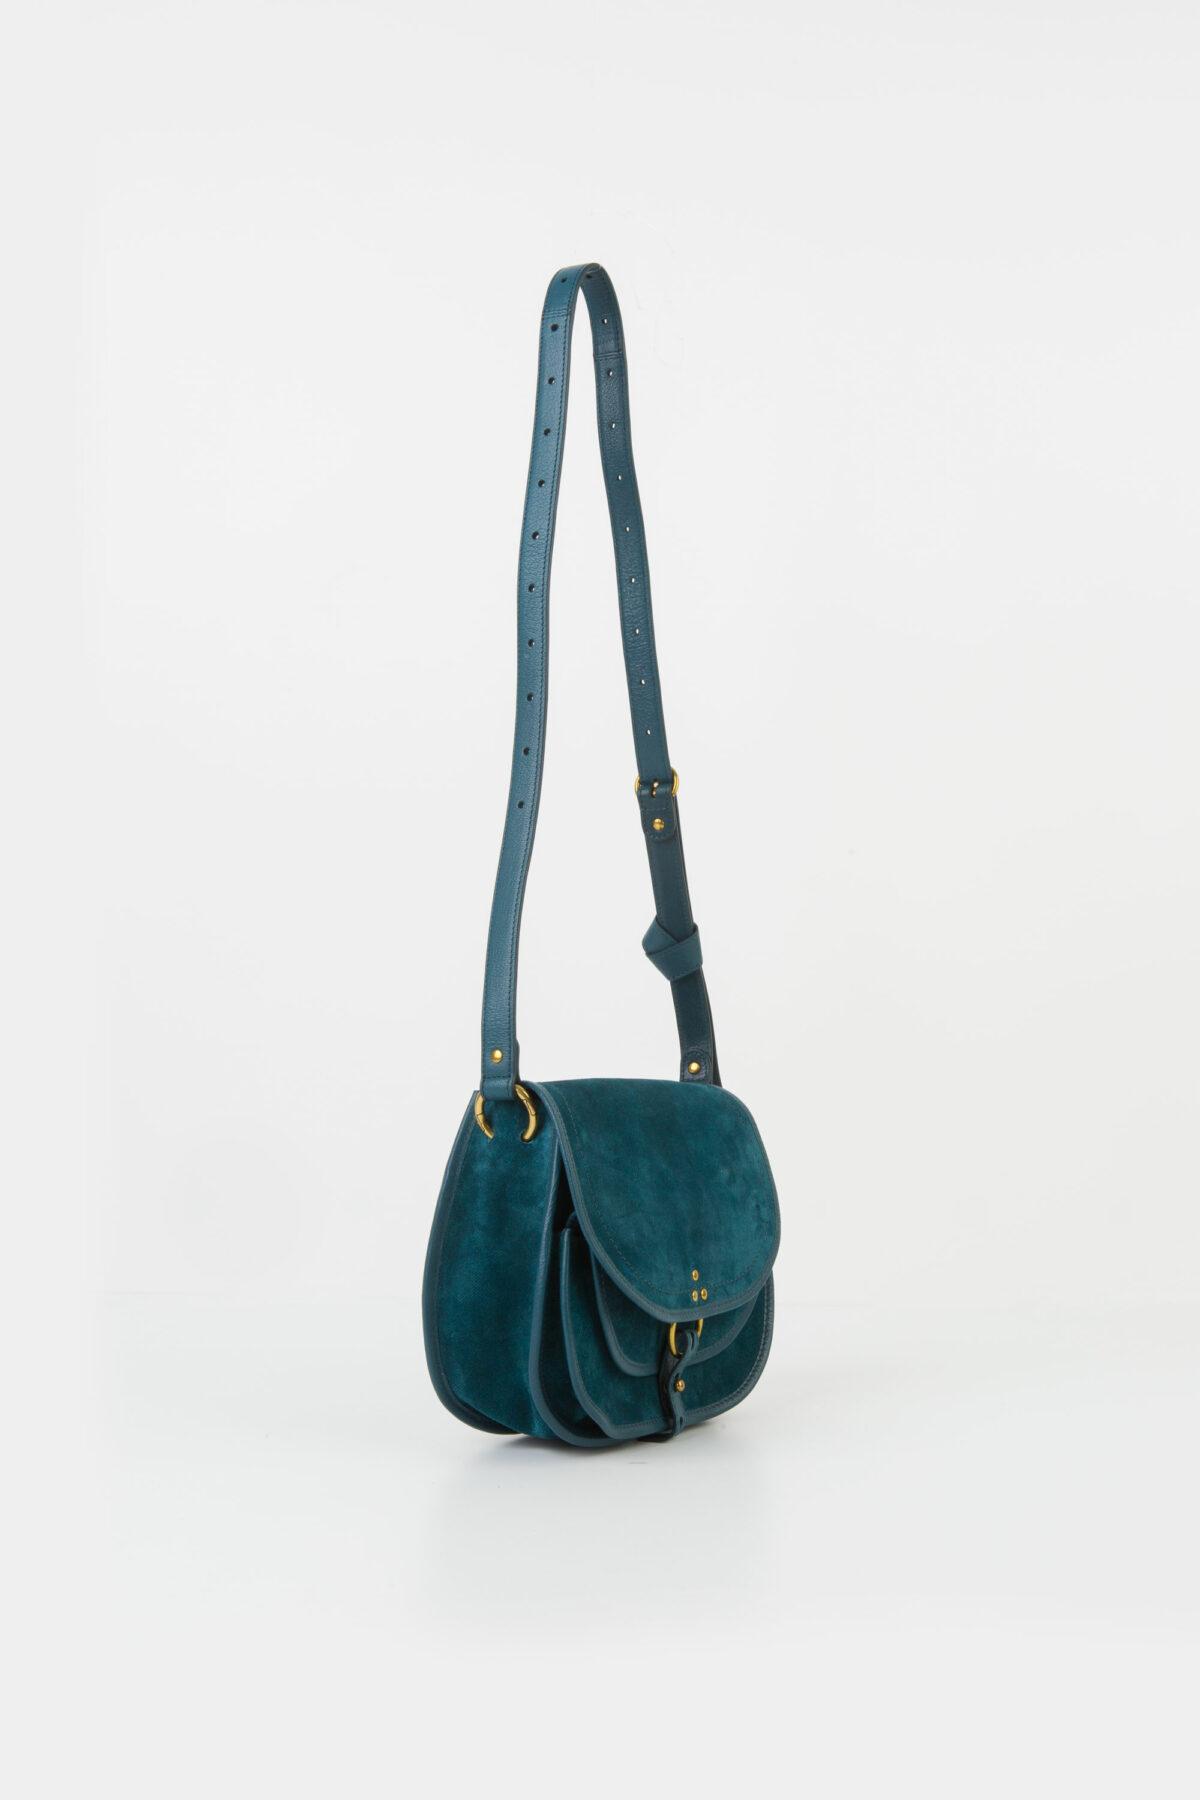 felix-medium-messenger-petrol-leather-bag-jerome-dreyfuss-matchboxathens